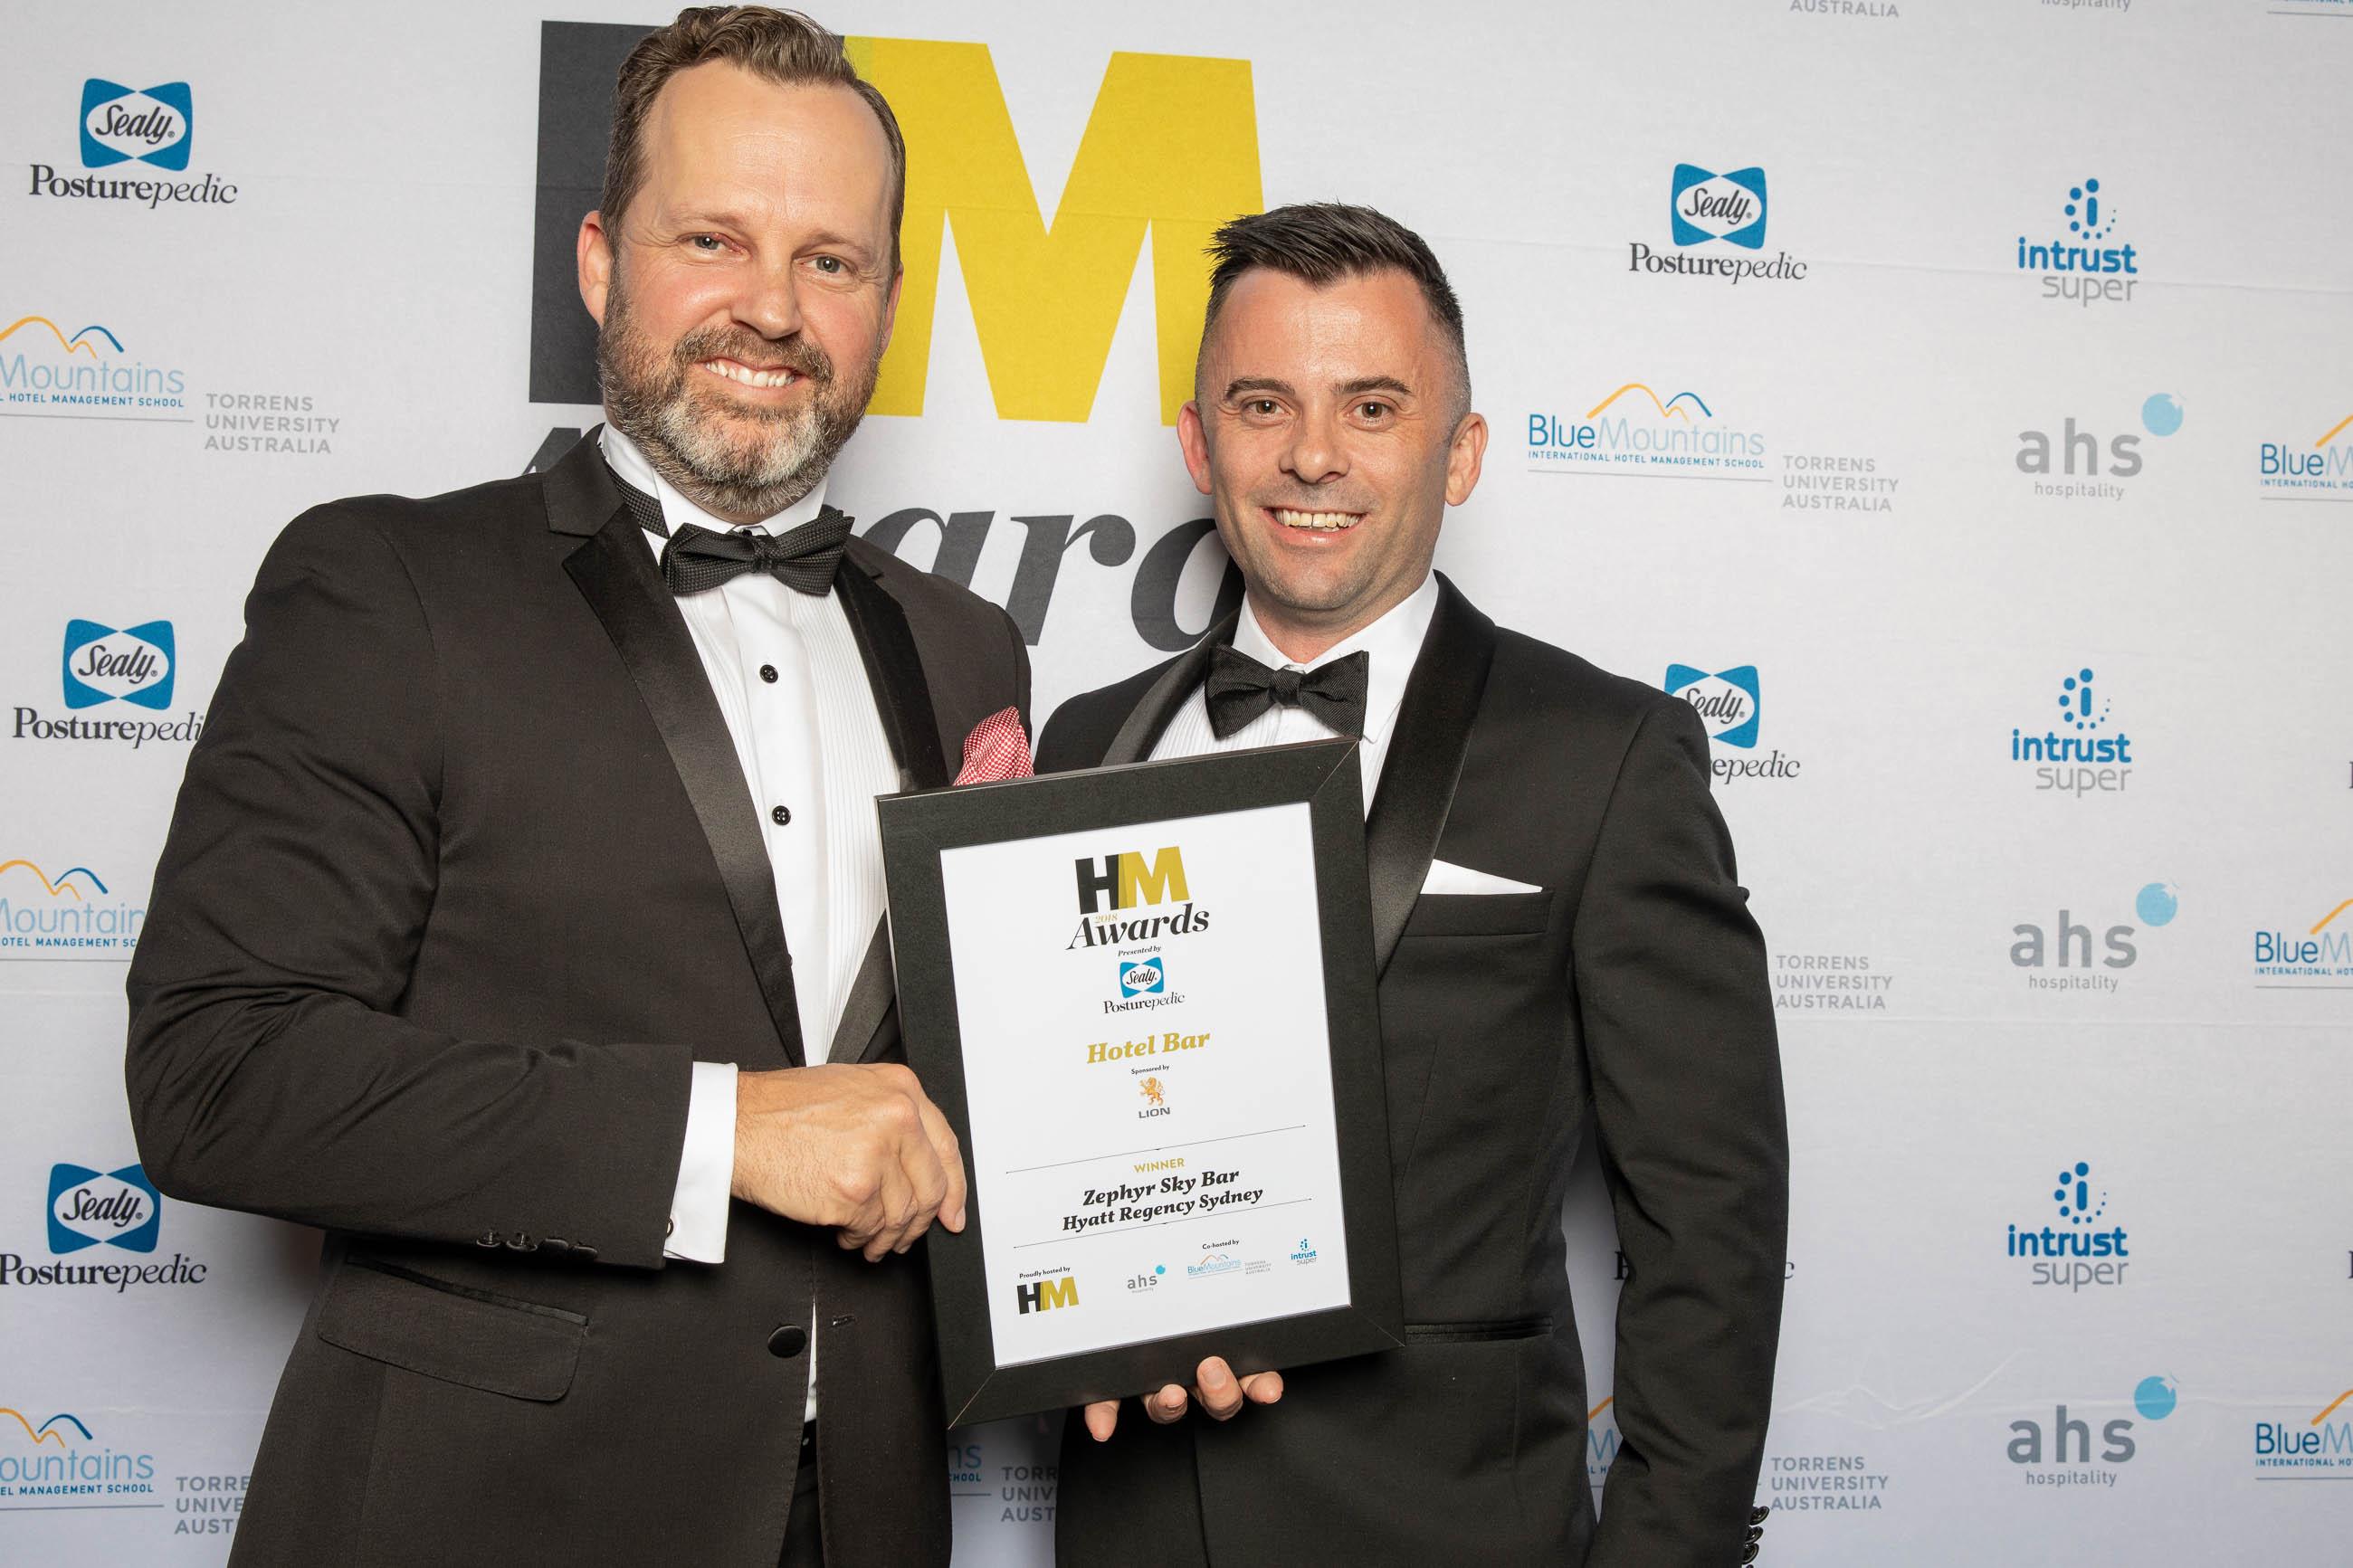 72ppi-HMawards-2018-official-award-wall-9999